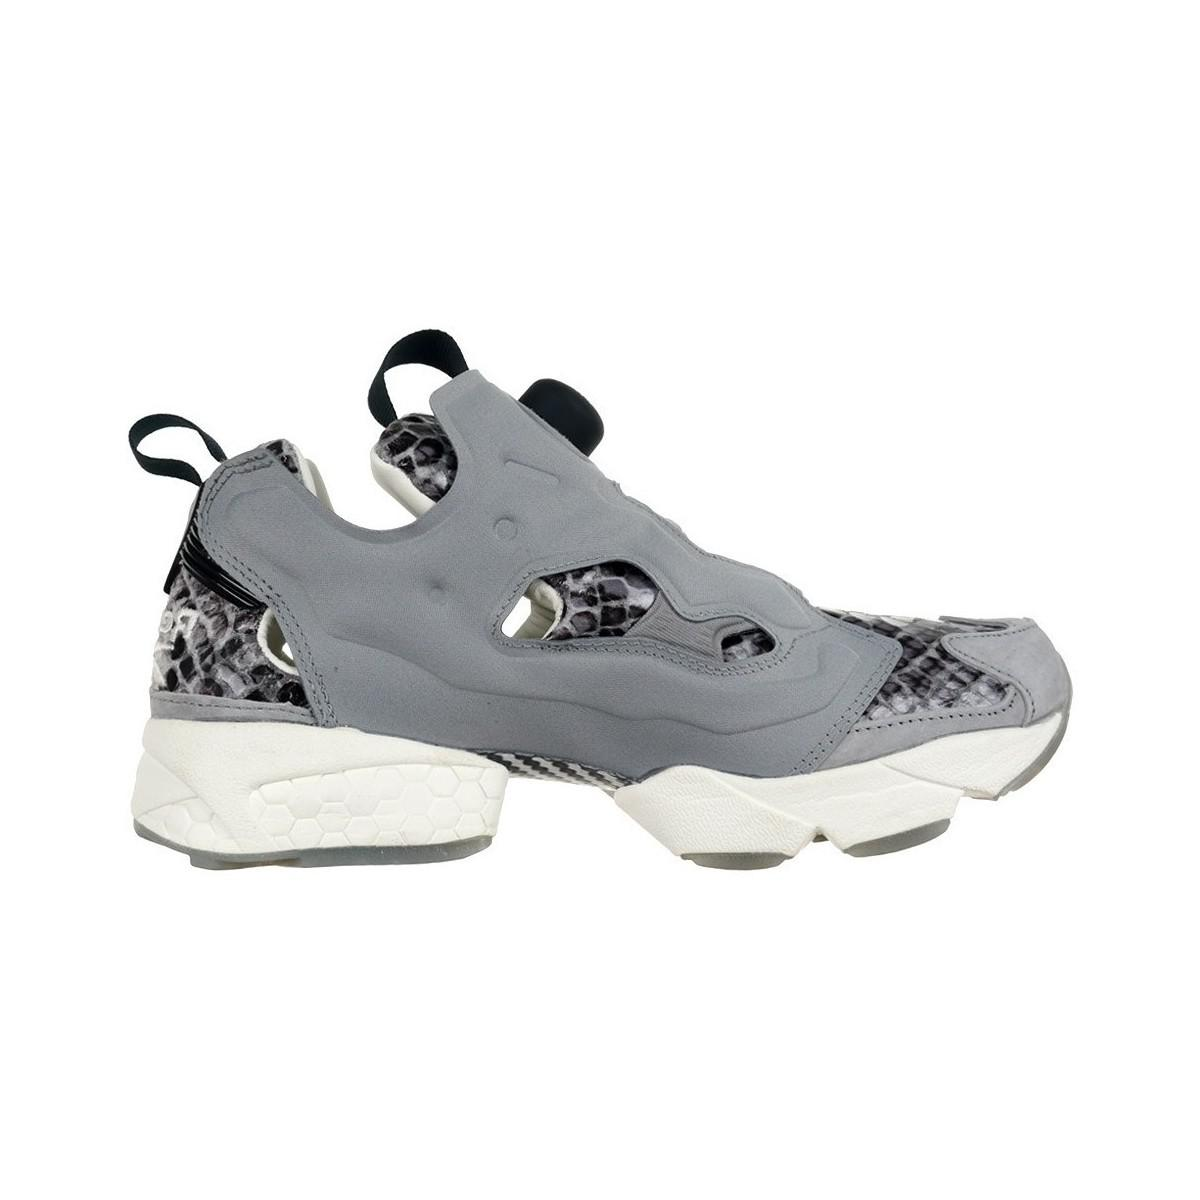 Reebok Classic Instapump Fury Disney Jungle Book Women s Shoes ... 944c4a9ed